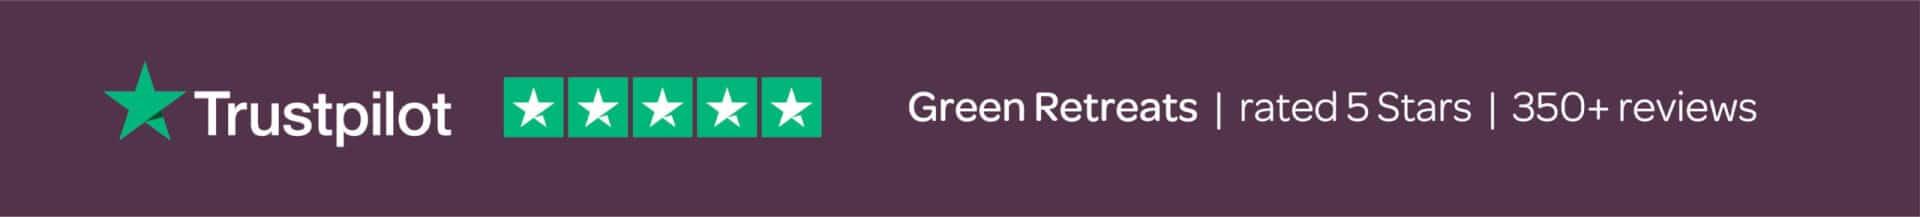 Green Retreats rated 5 Star on Trustpilot